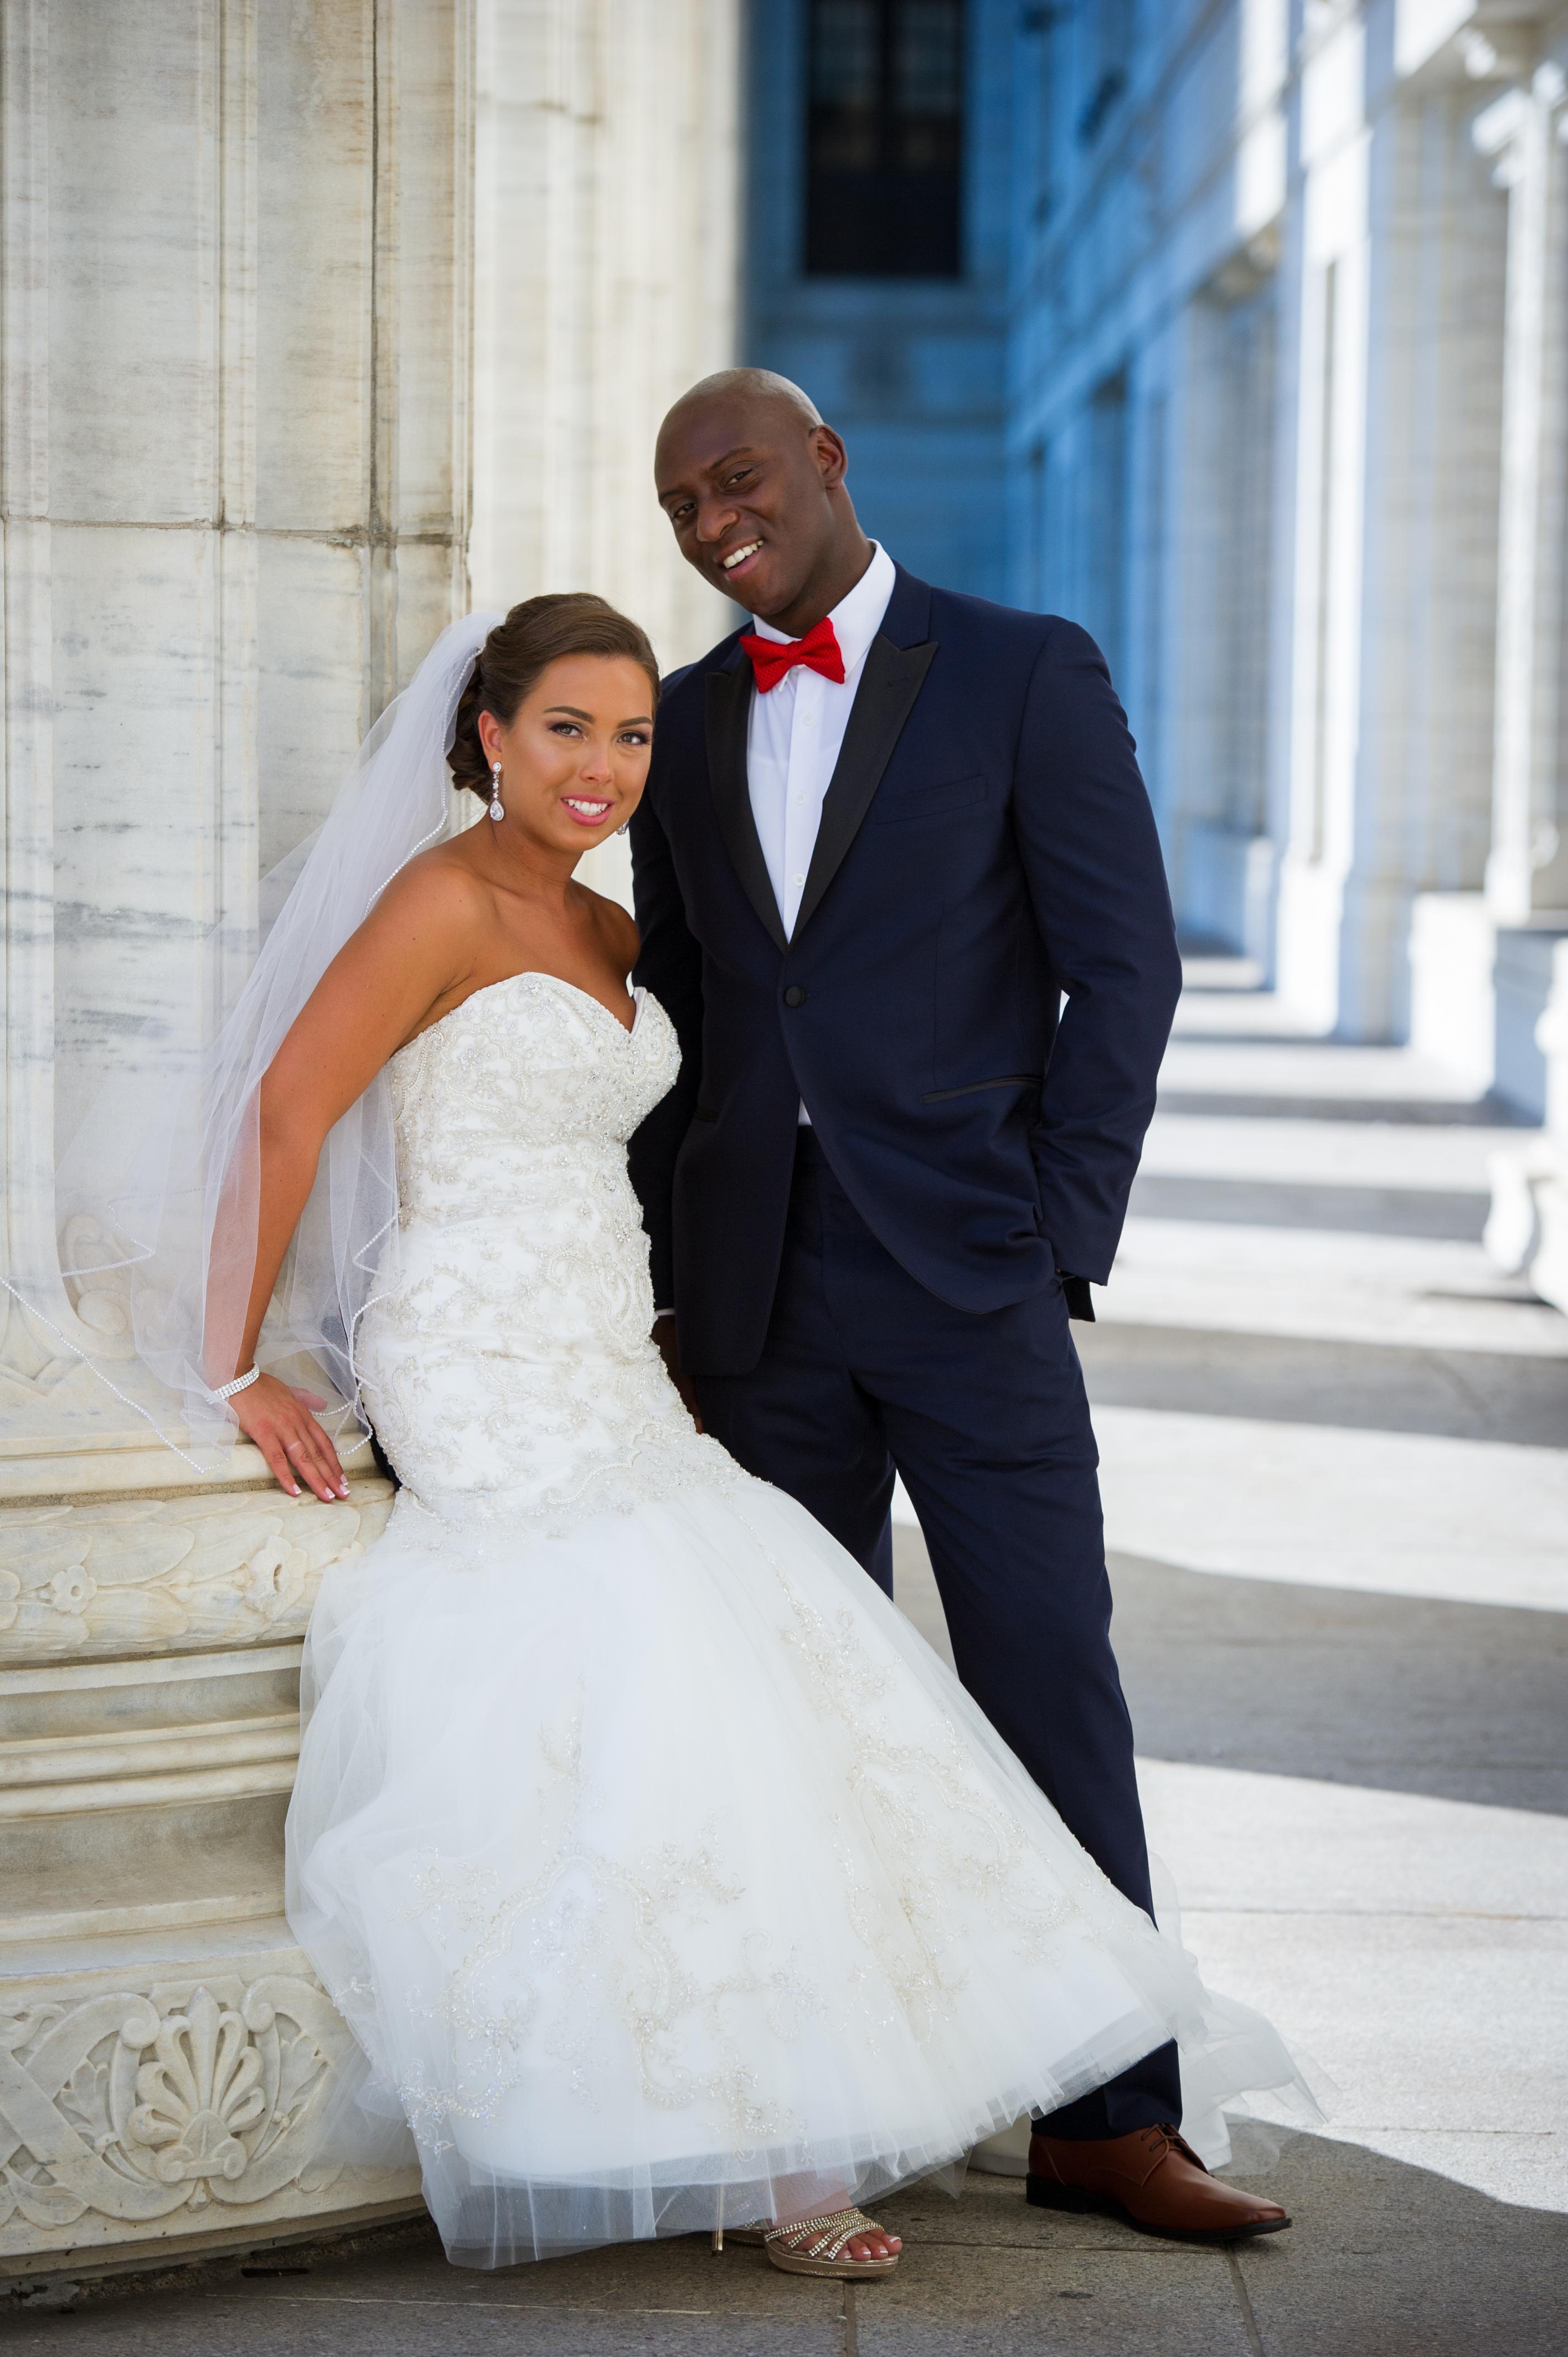 Saratoga Wedding Planner Capital Region Wedding A Lively Event